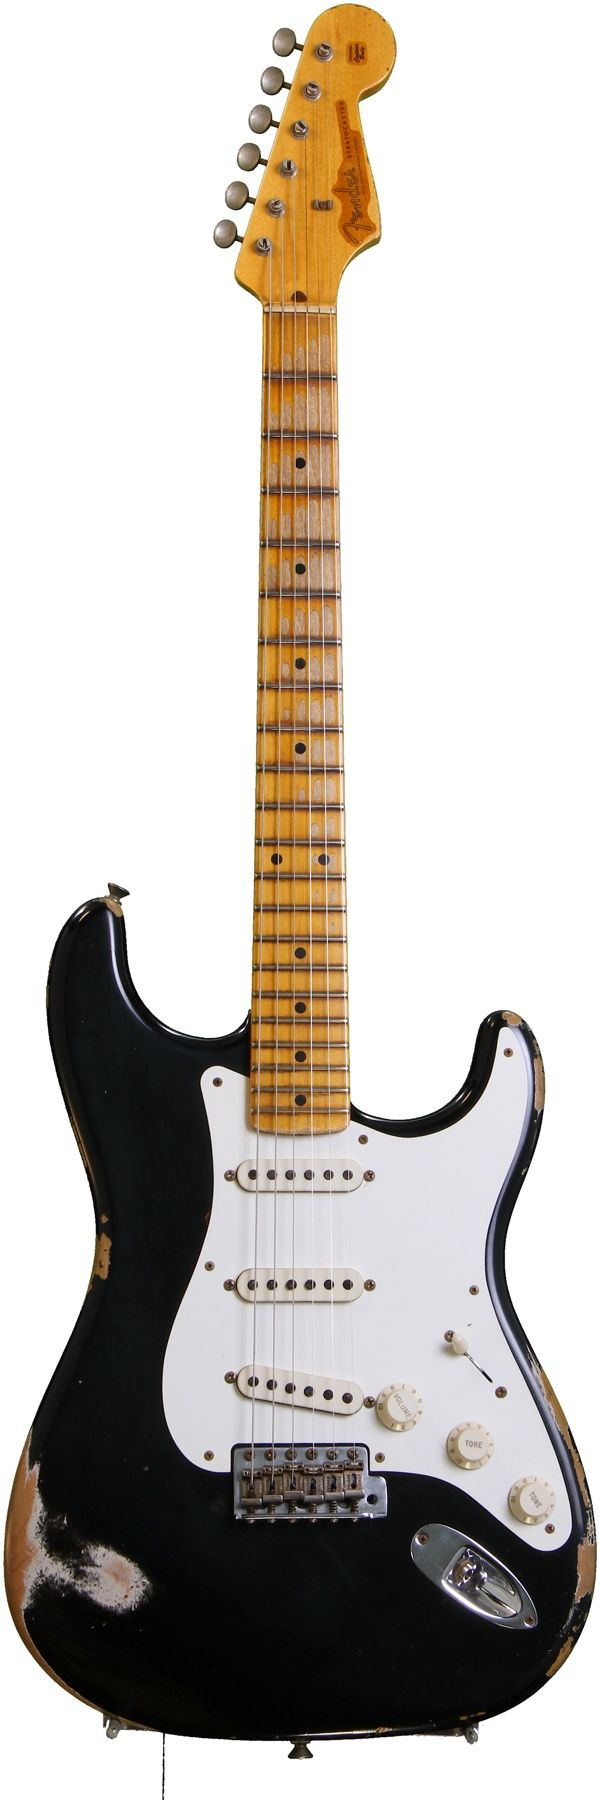 Fender Custom Shop 1956 Heavy Relic Strat - Black Ice   Sweetwater.com